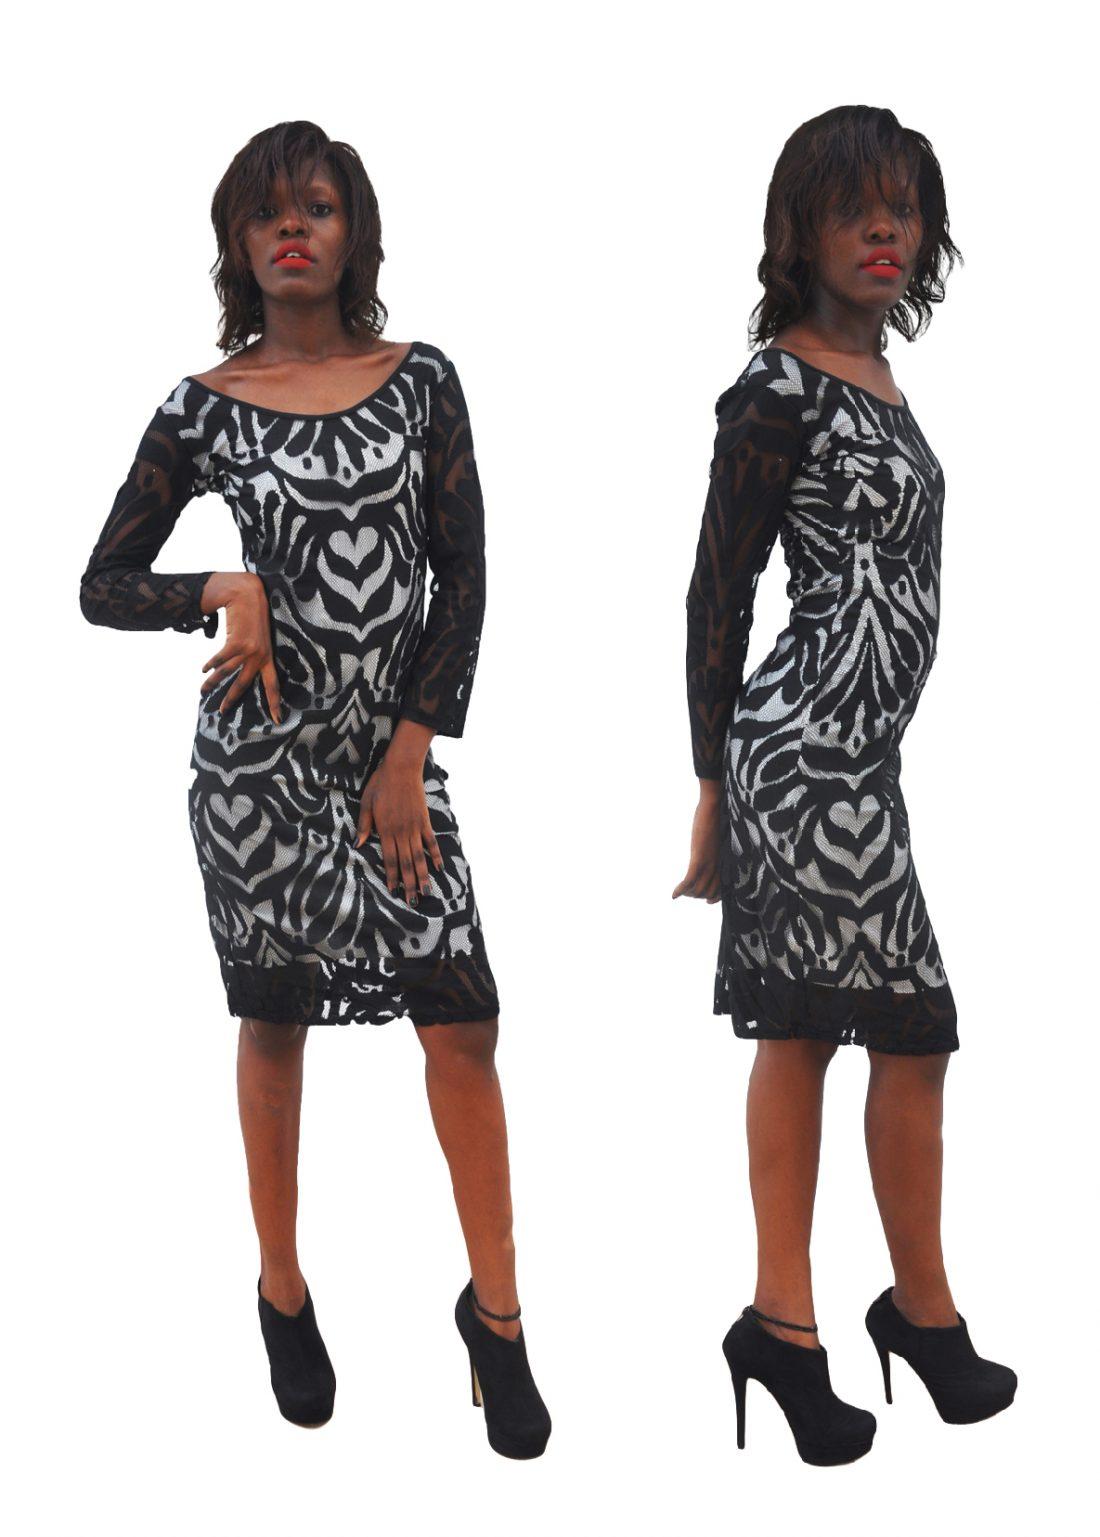 M0287 blackwhite1 Party Dresses maureens.com boutique